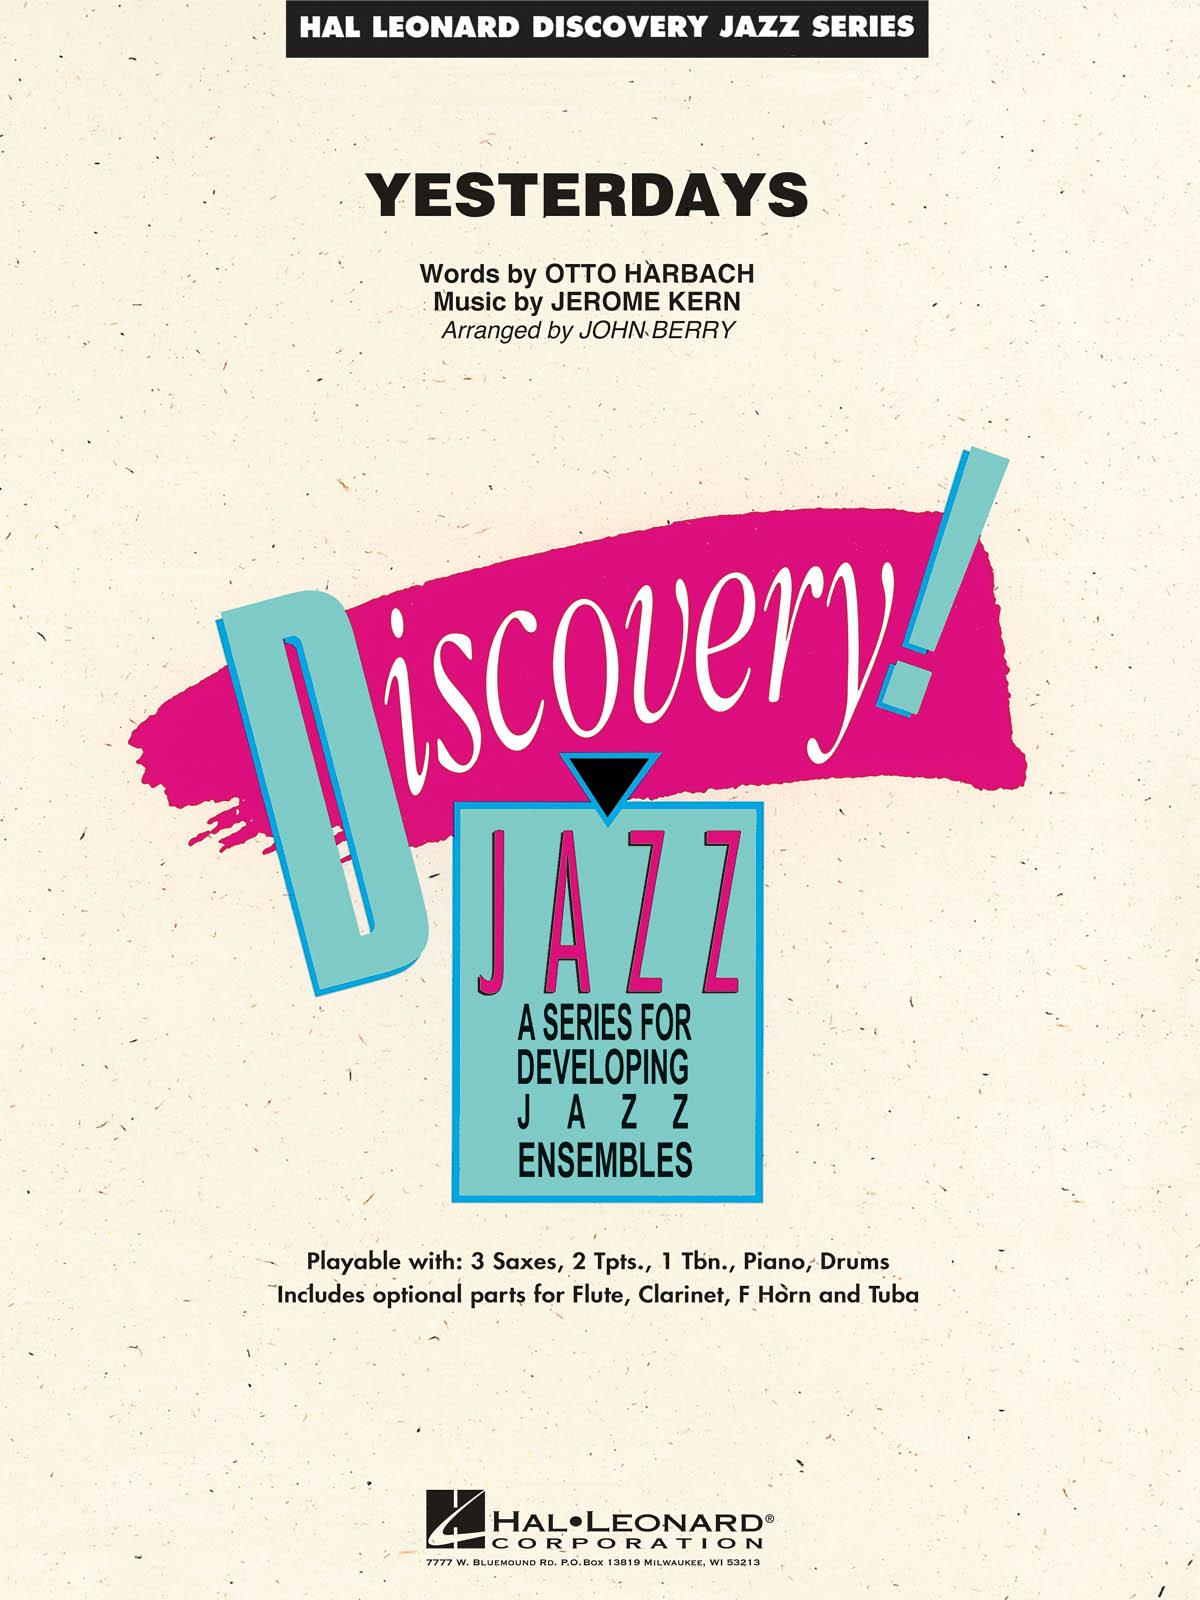 Yesterdays: Discovery Jazz